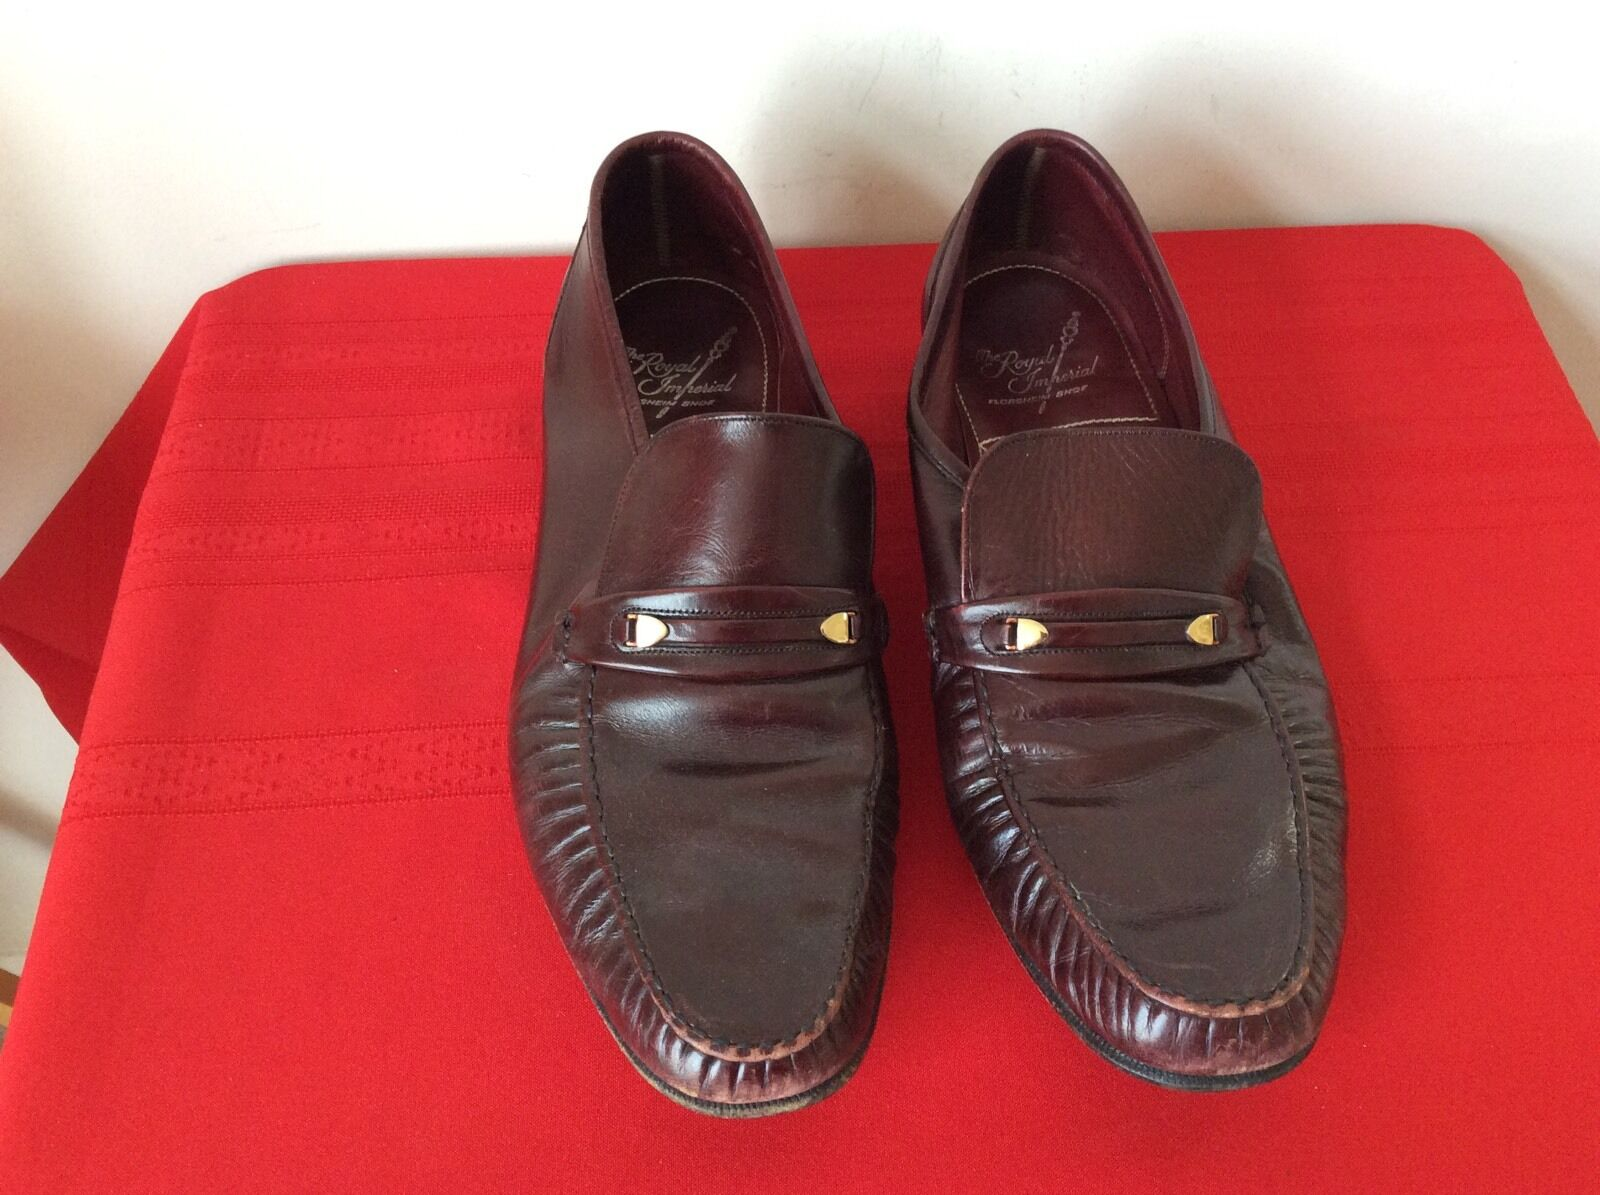 Men's Florsheim sz. Royal Imperial Brown Slip-on Dress Loafers sz. Florsheim 10.5 D. (b17) 7dbf11